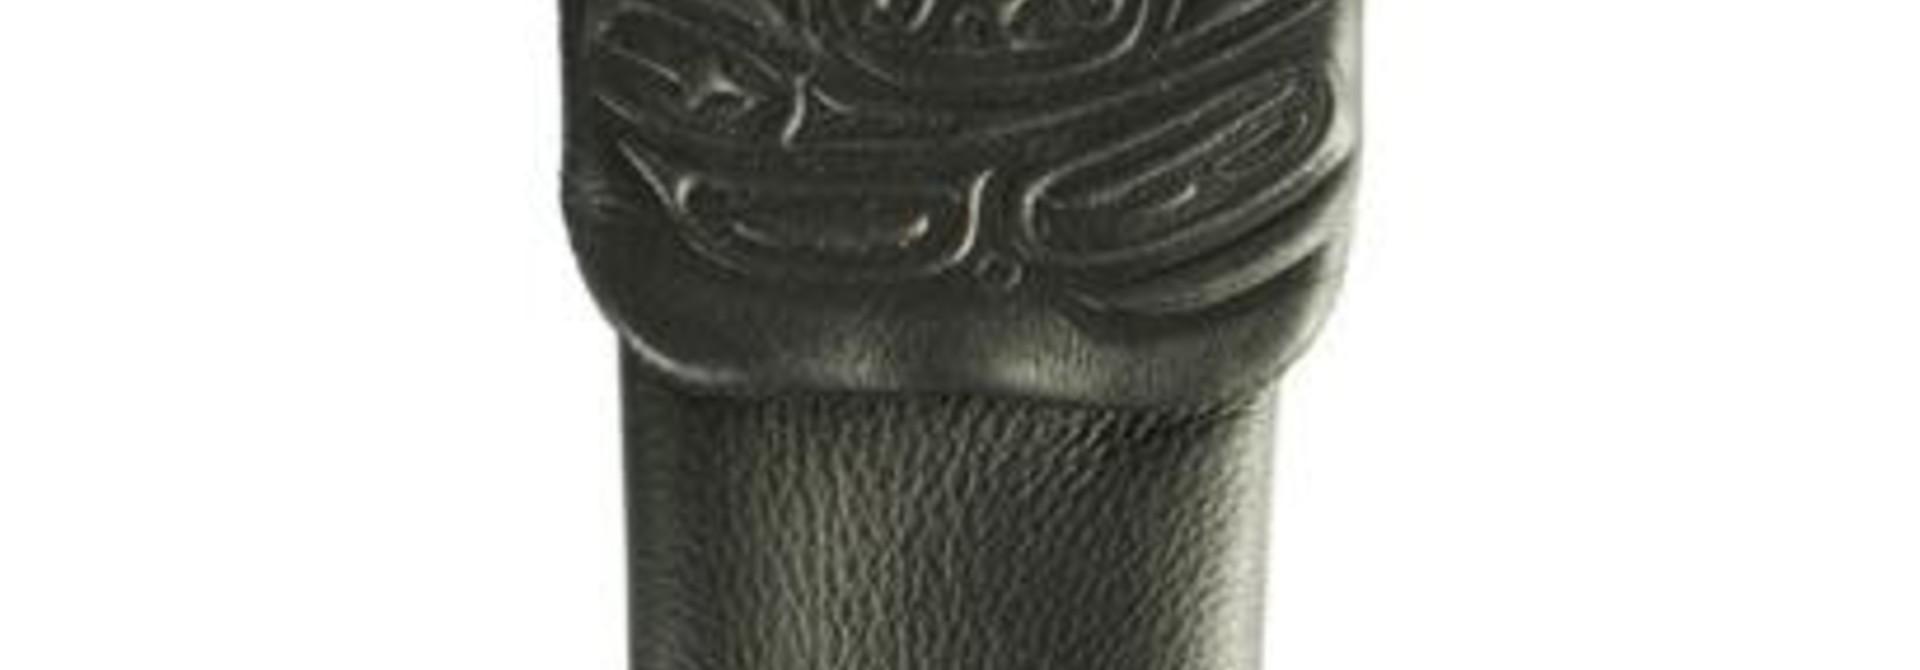 Leather embossed Eyeglass Case Black -Raven by Corrine Hunt